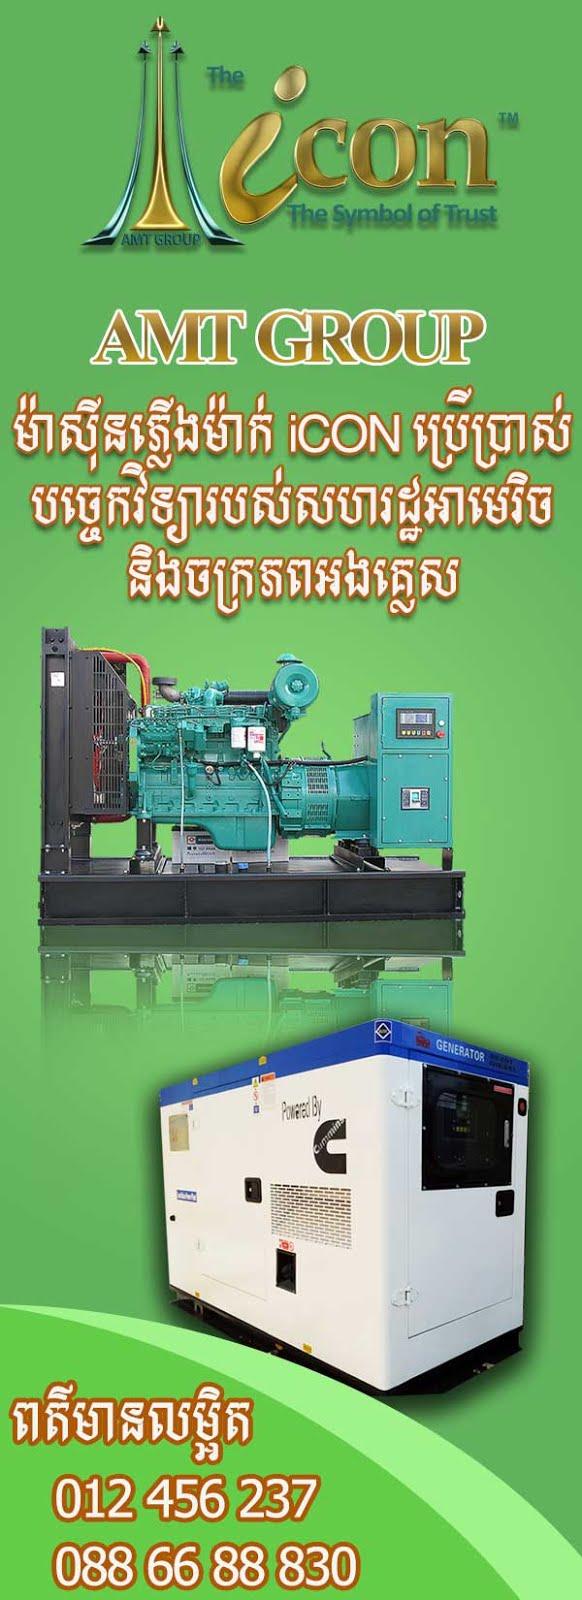 AMT Generator